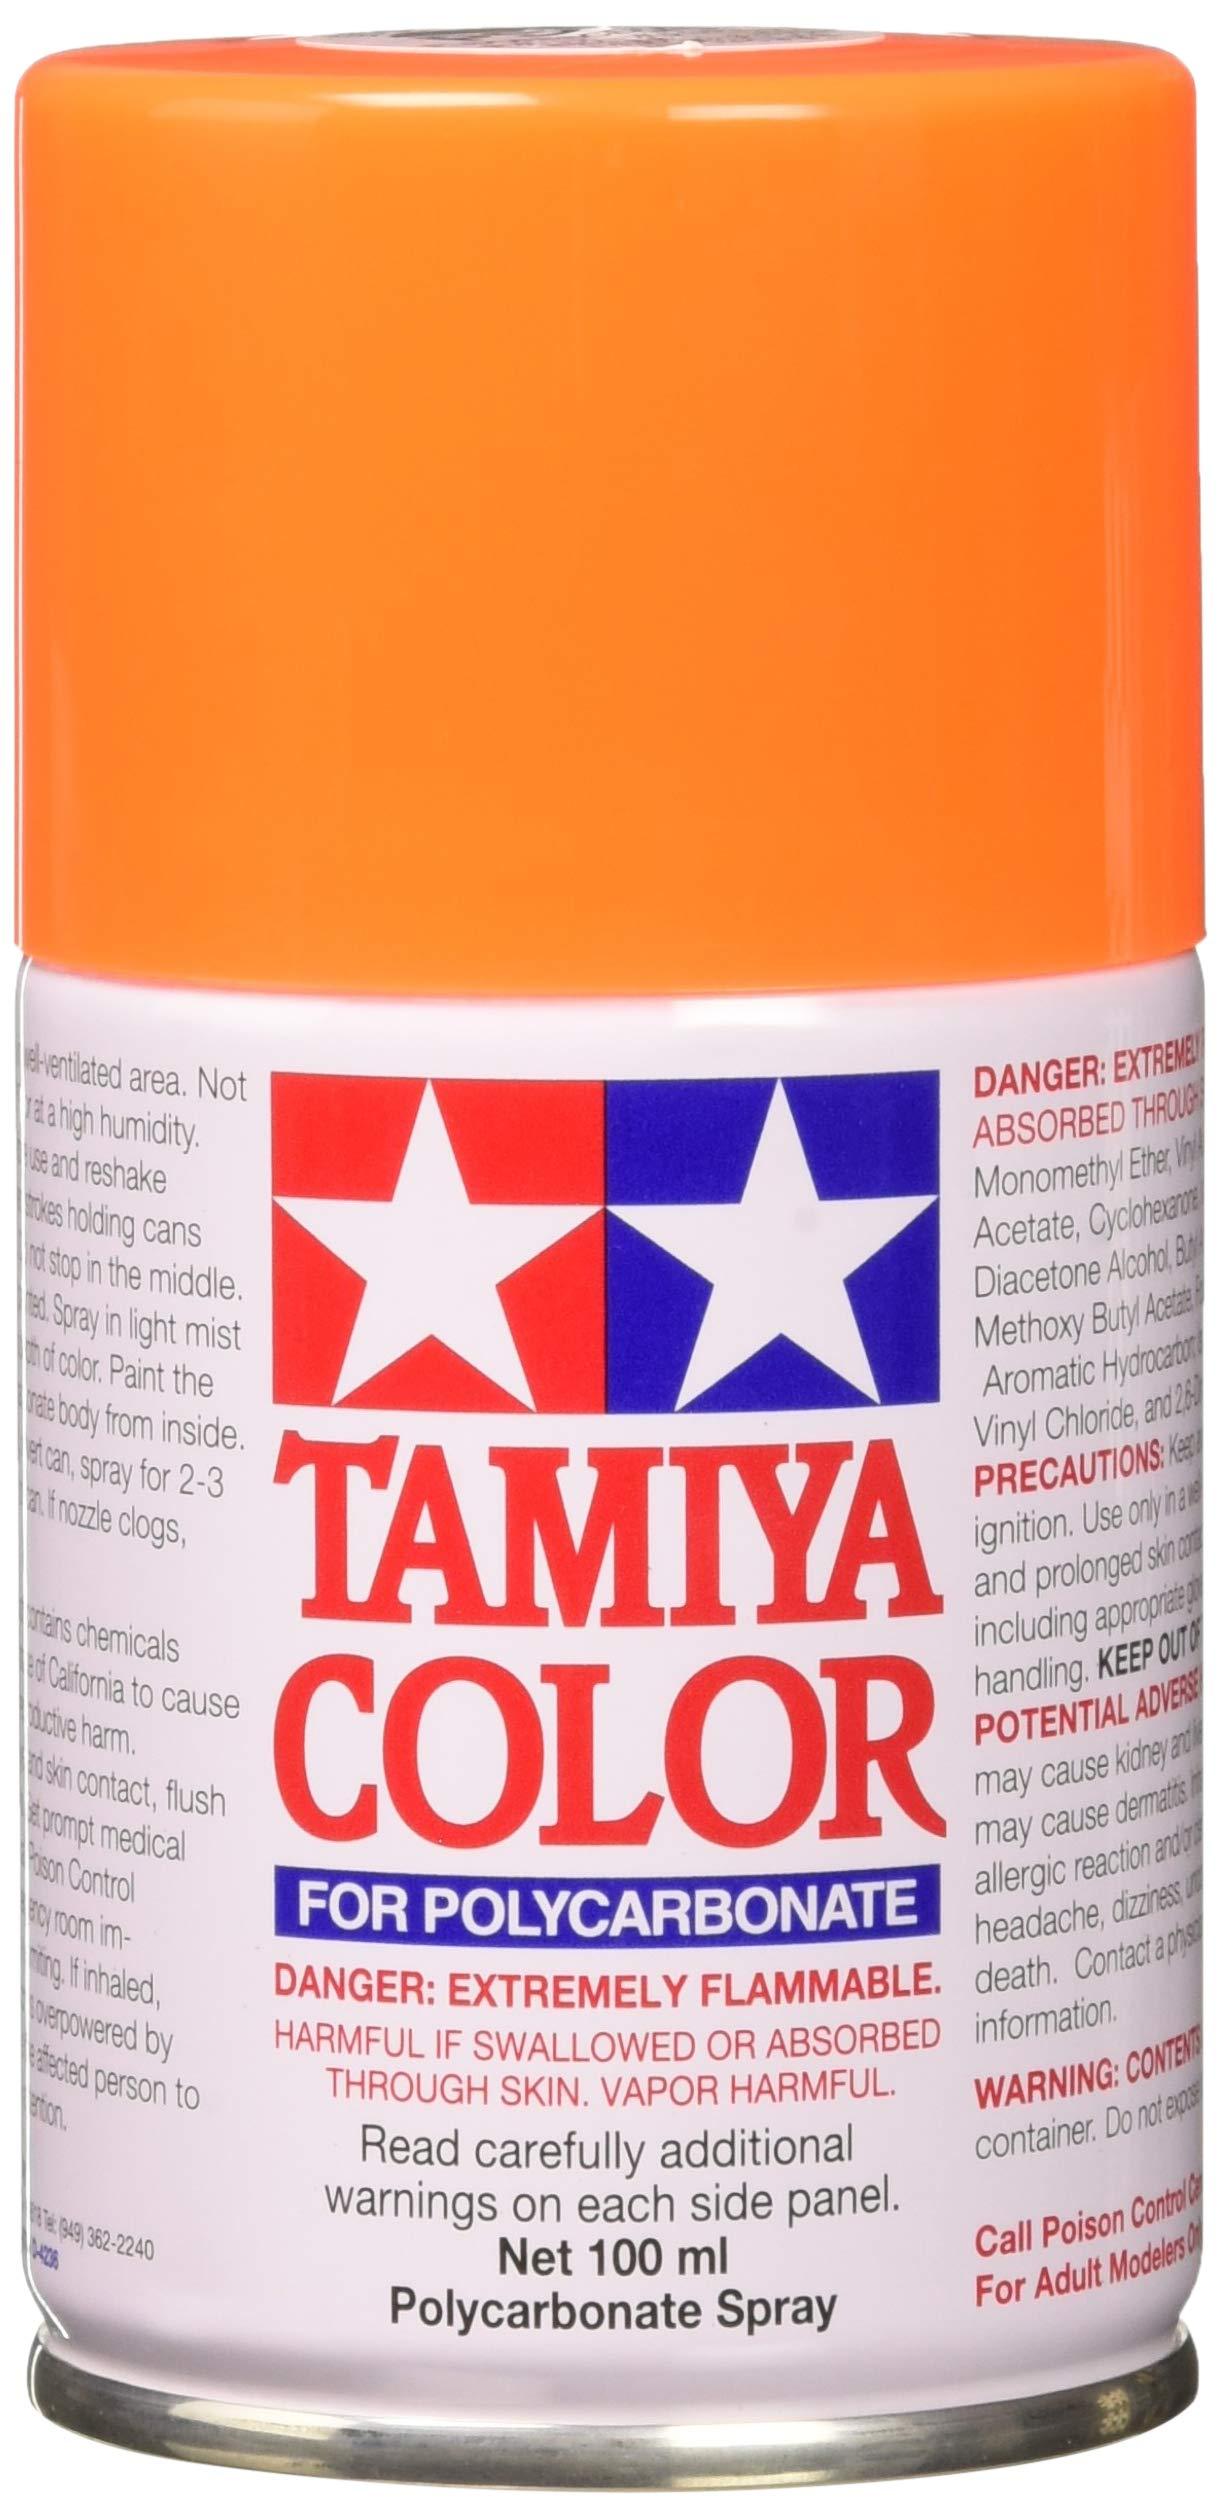 Tamiya 86024 Paint Spray, Fluorescent Orange